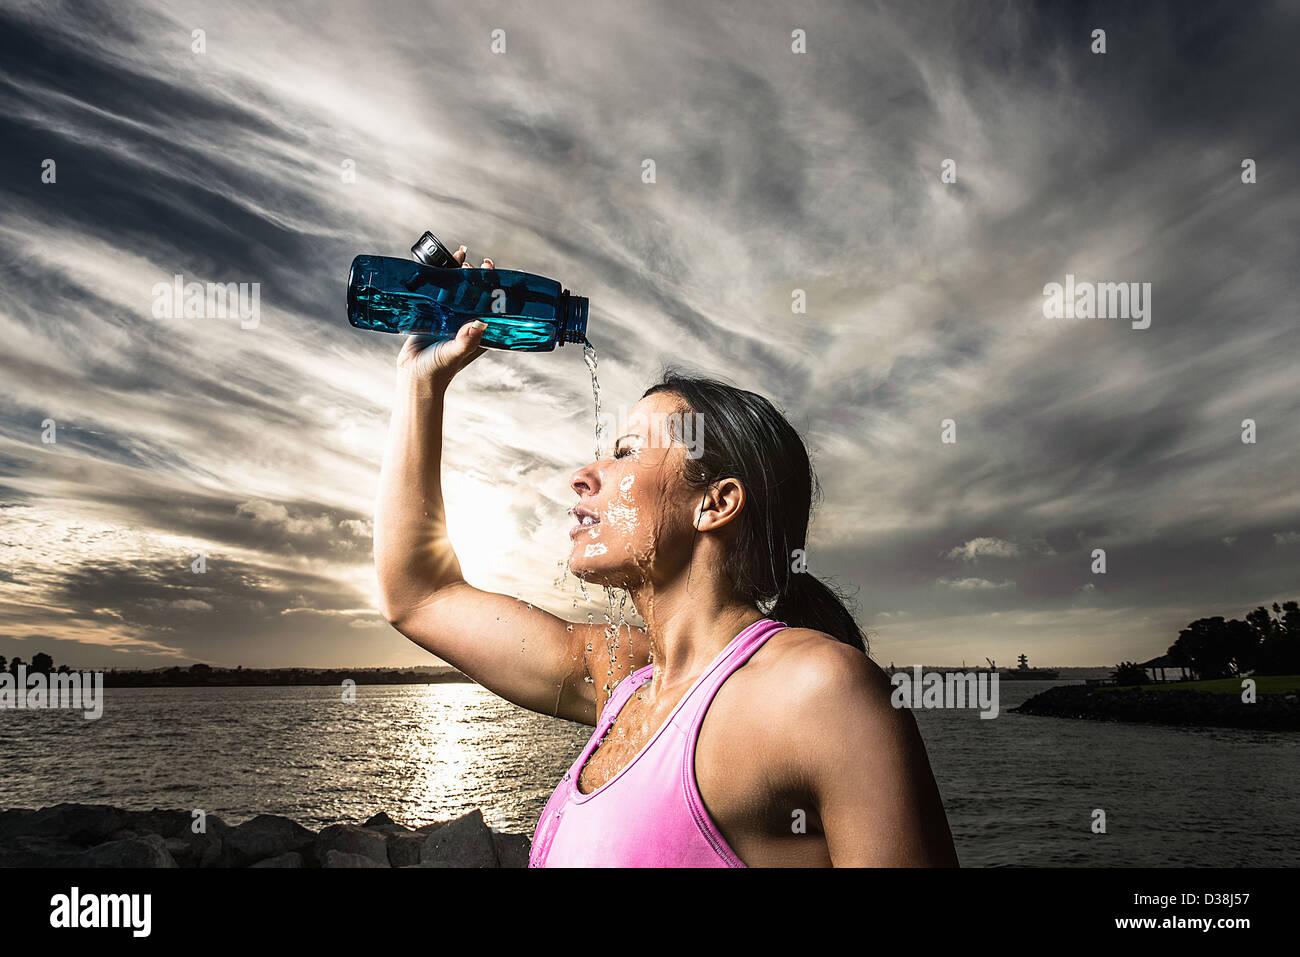 Runner verter agua sobre ella Foto de stock